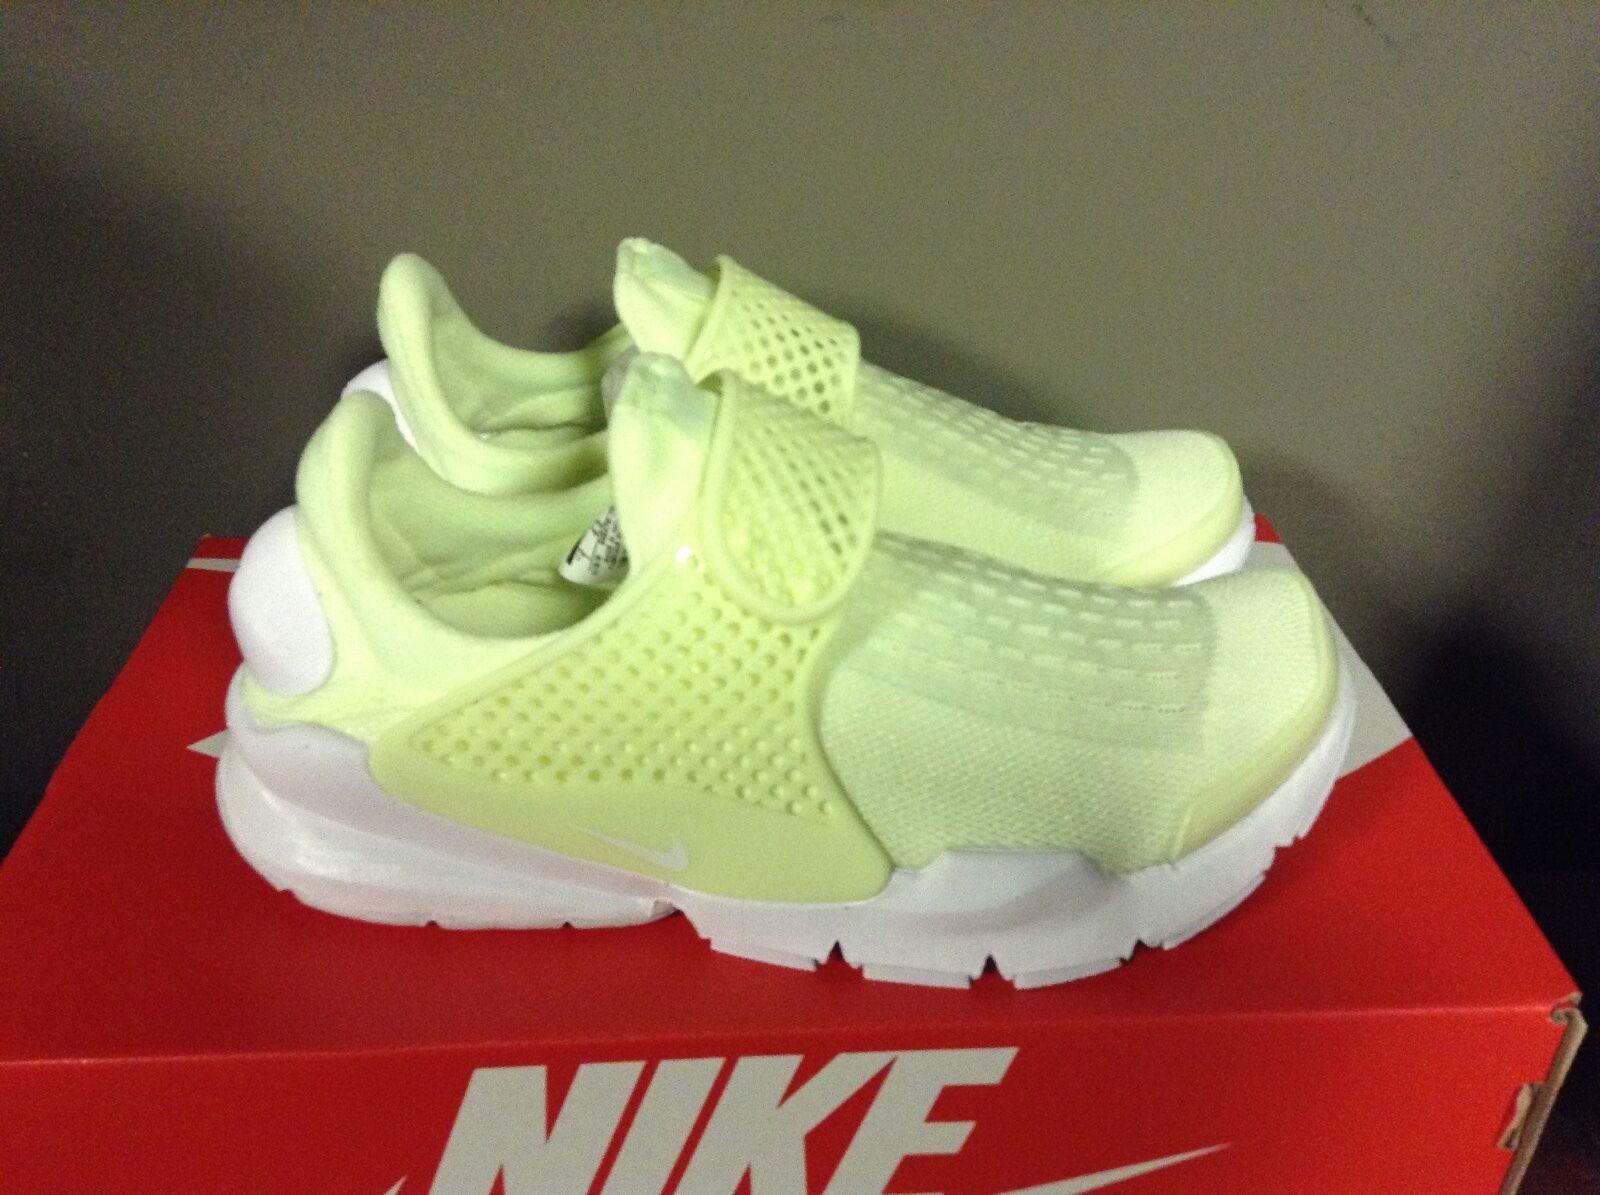 Nike WMNS Sock Dart Volt 848475-701 Barely Volt White Women's Brand discount